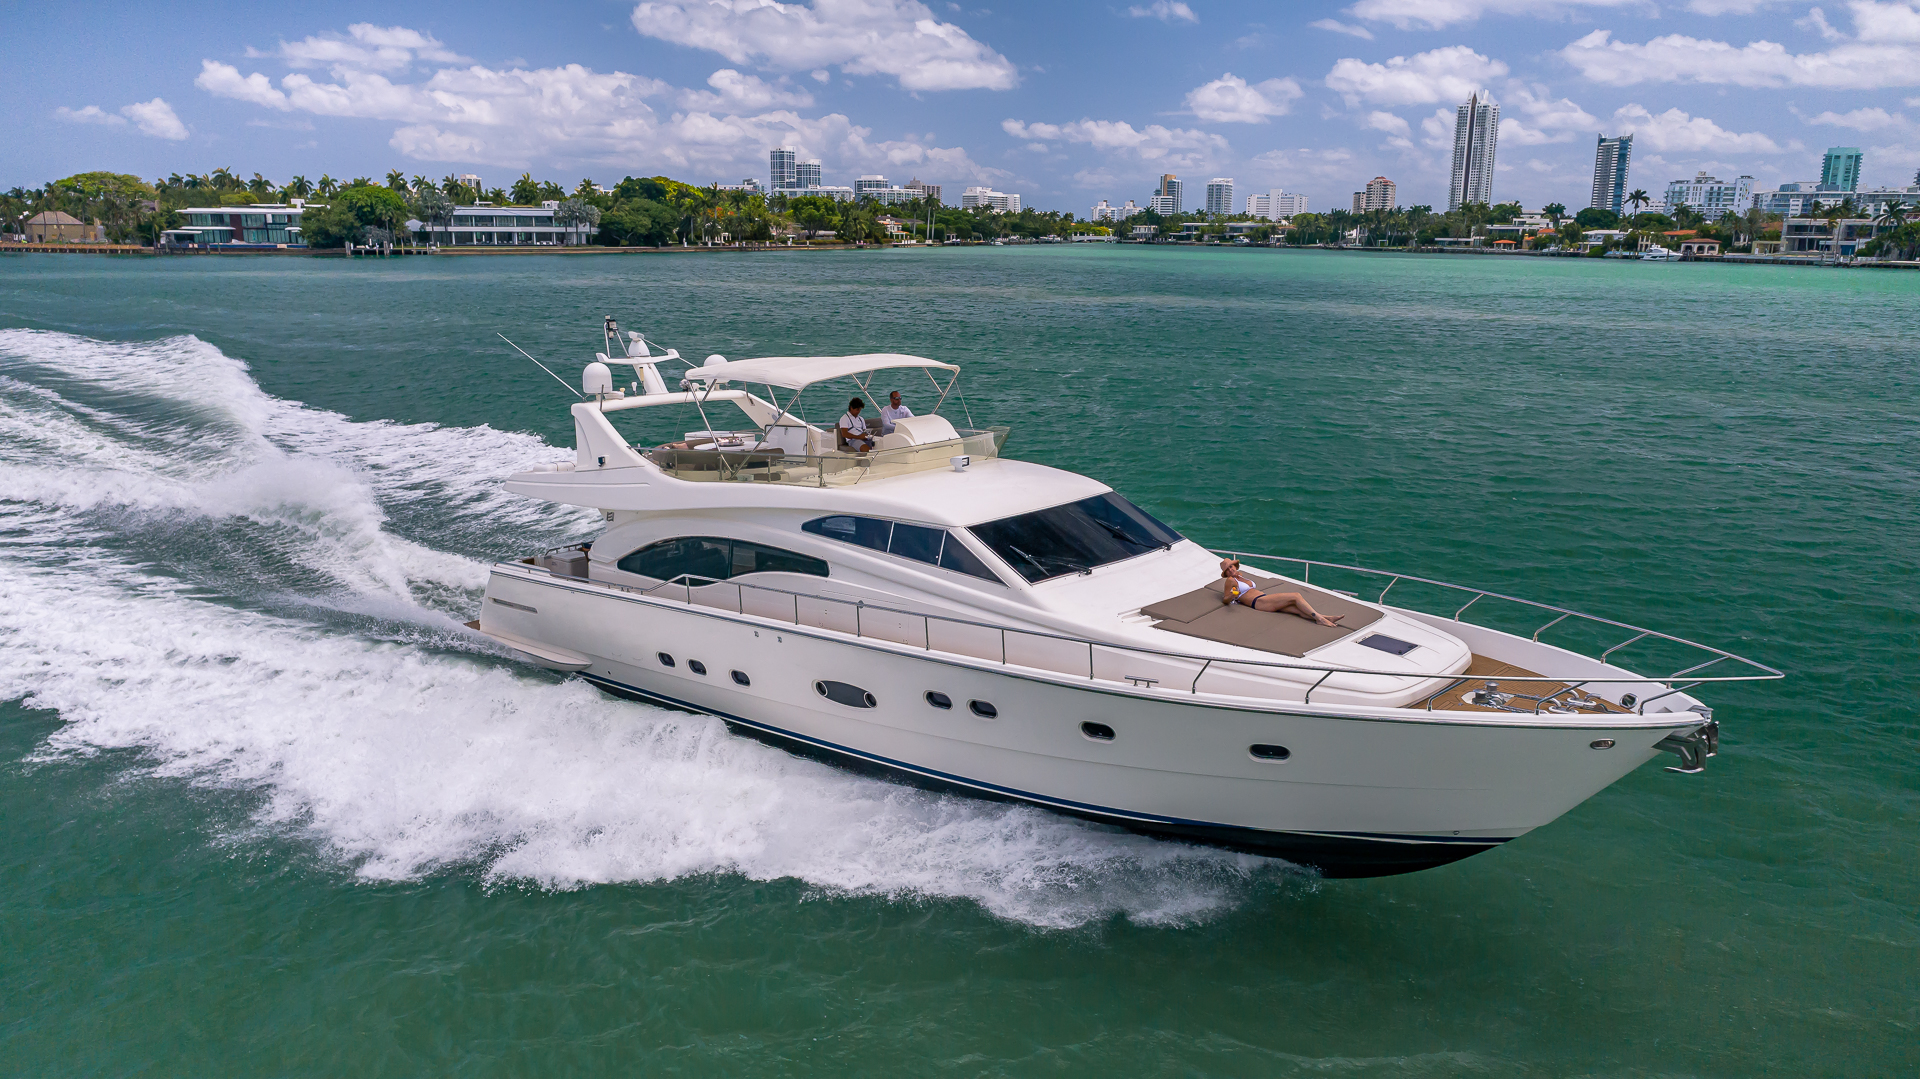 70' Ferretti Luxury Yacht Charters